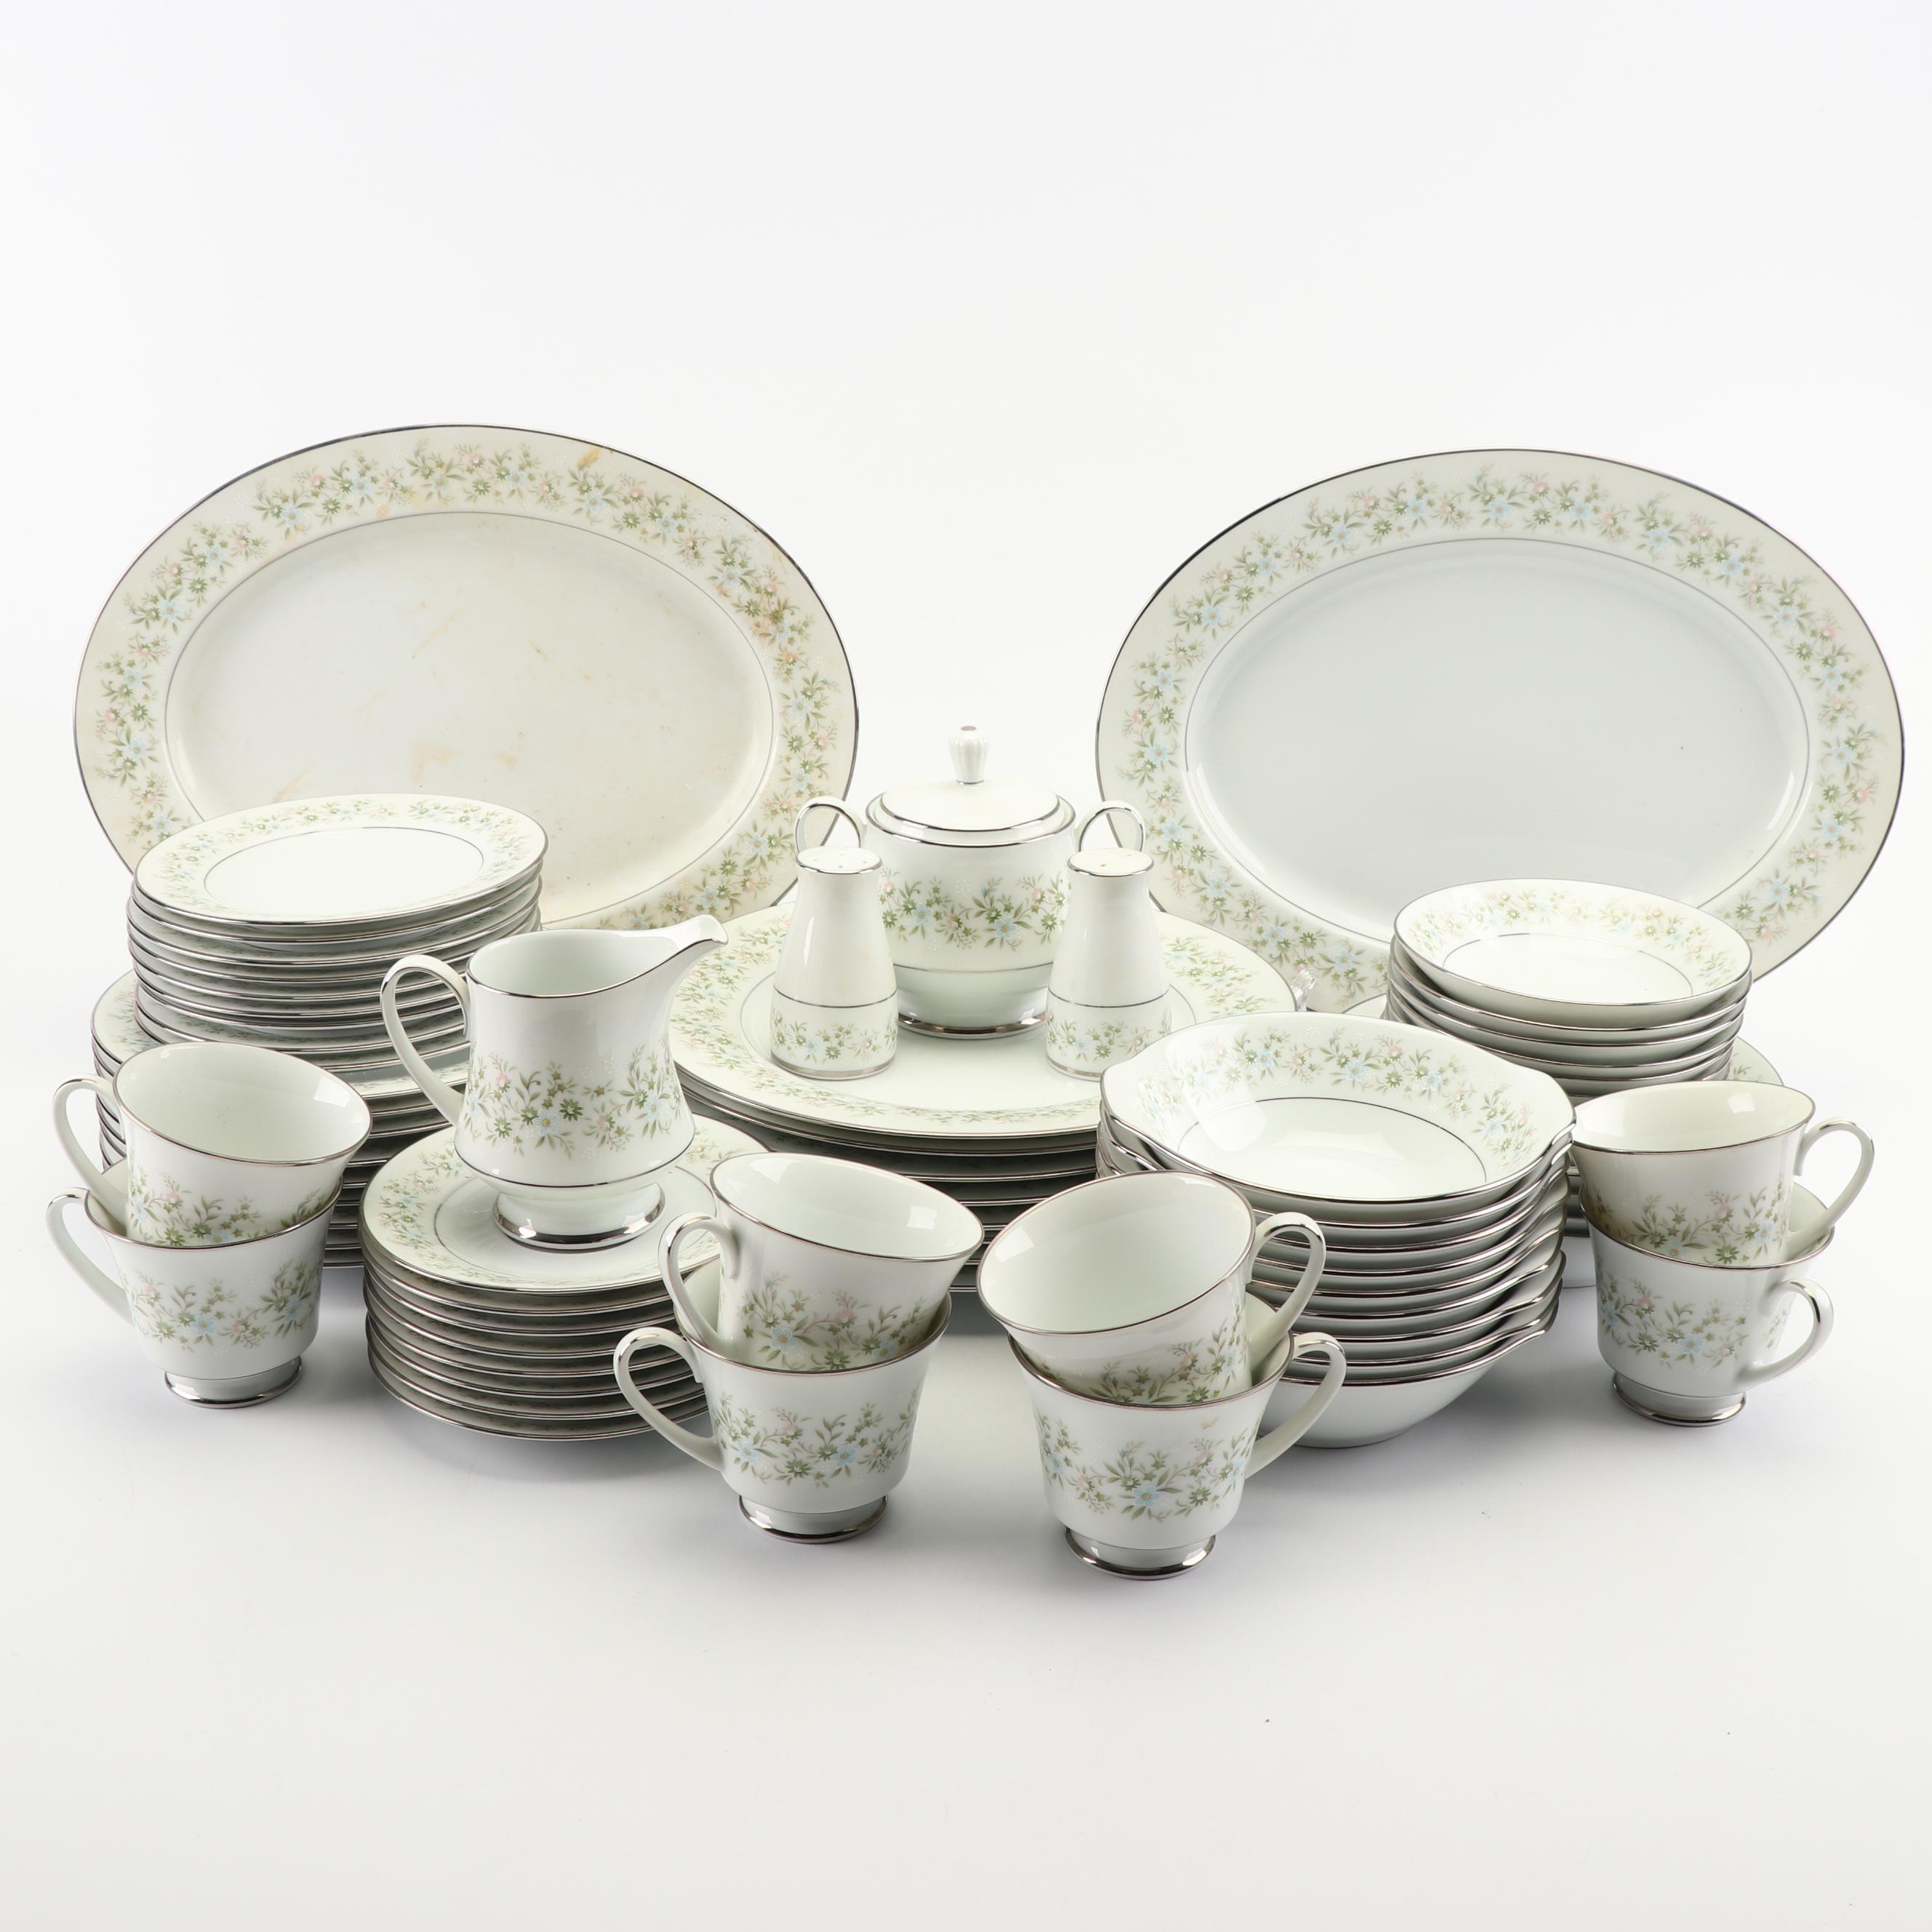 "Vintage Noritake ""Savannah"" Porcelain Dinnerware"